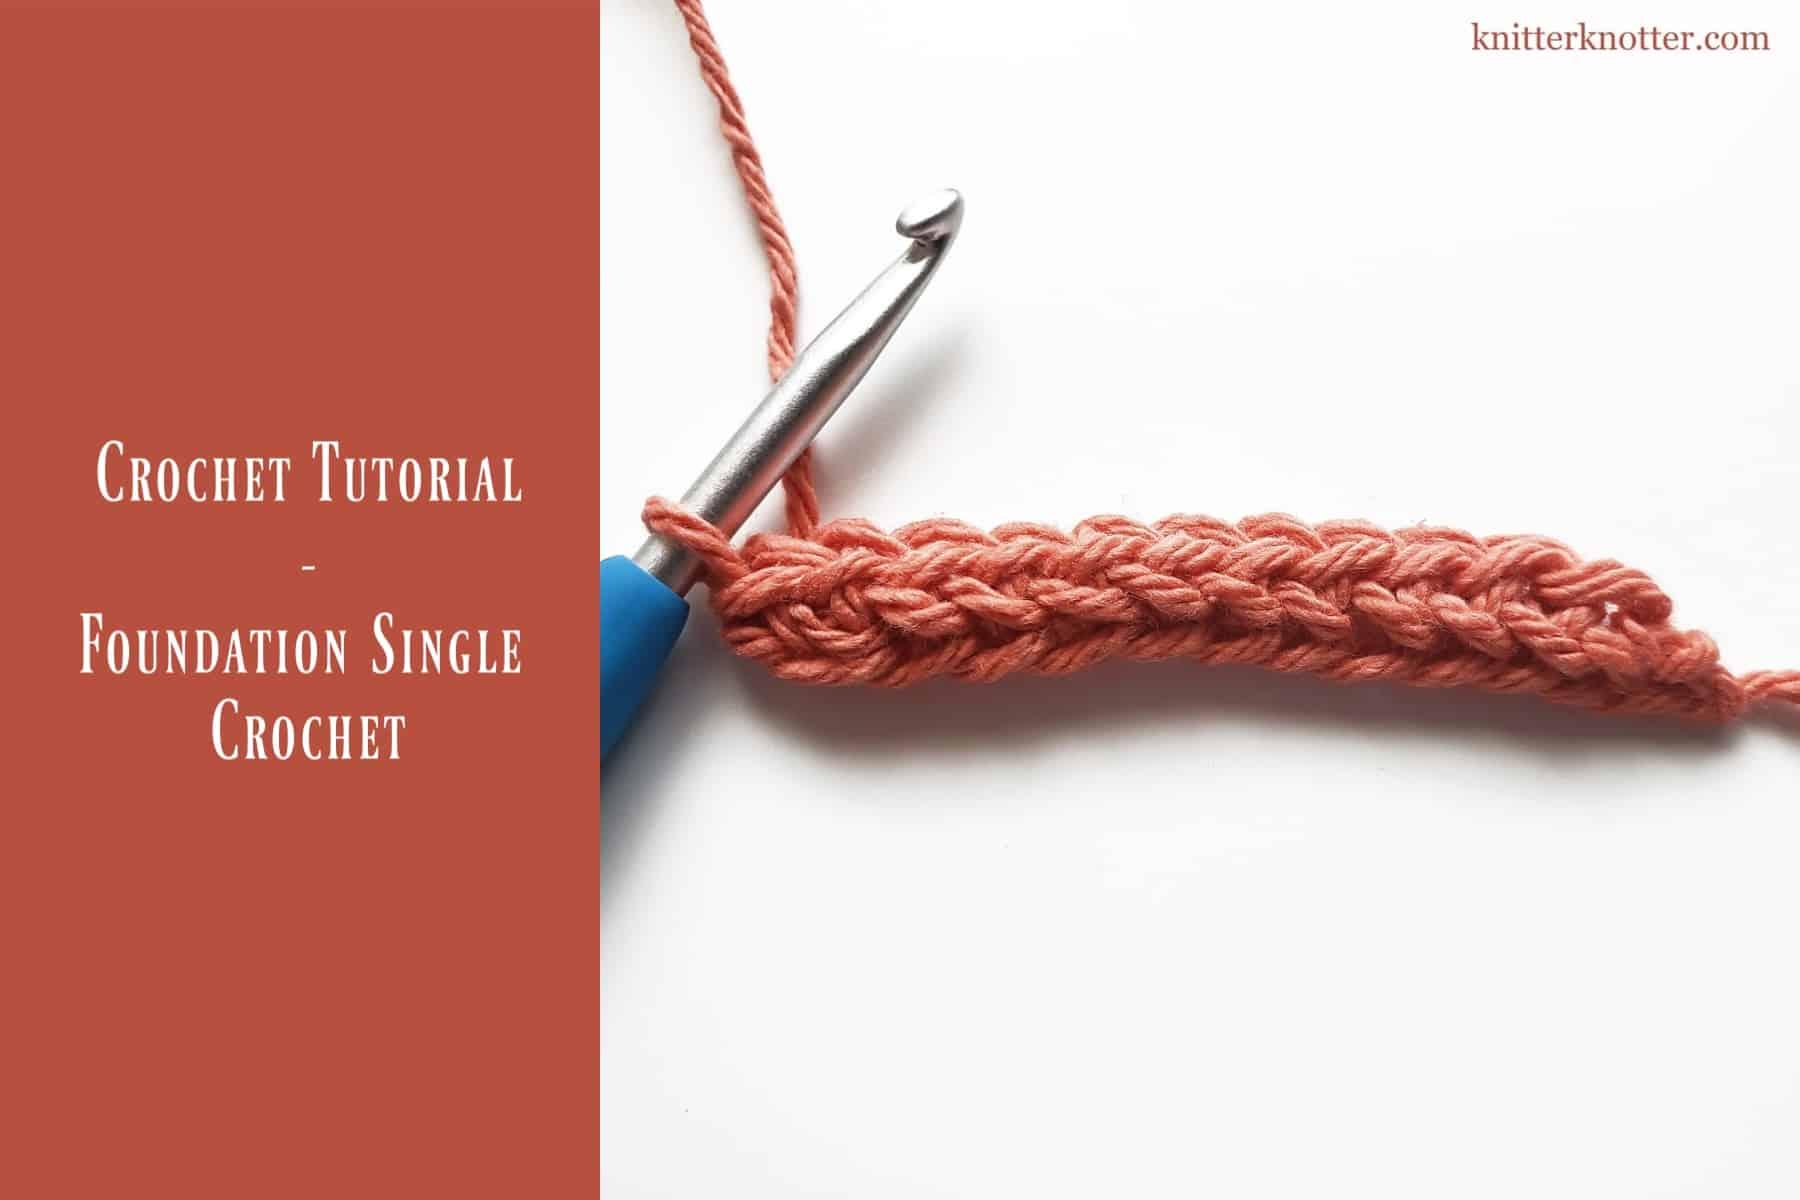 Tutorial Foundation Single Crochet Knitterknotter